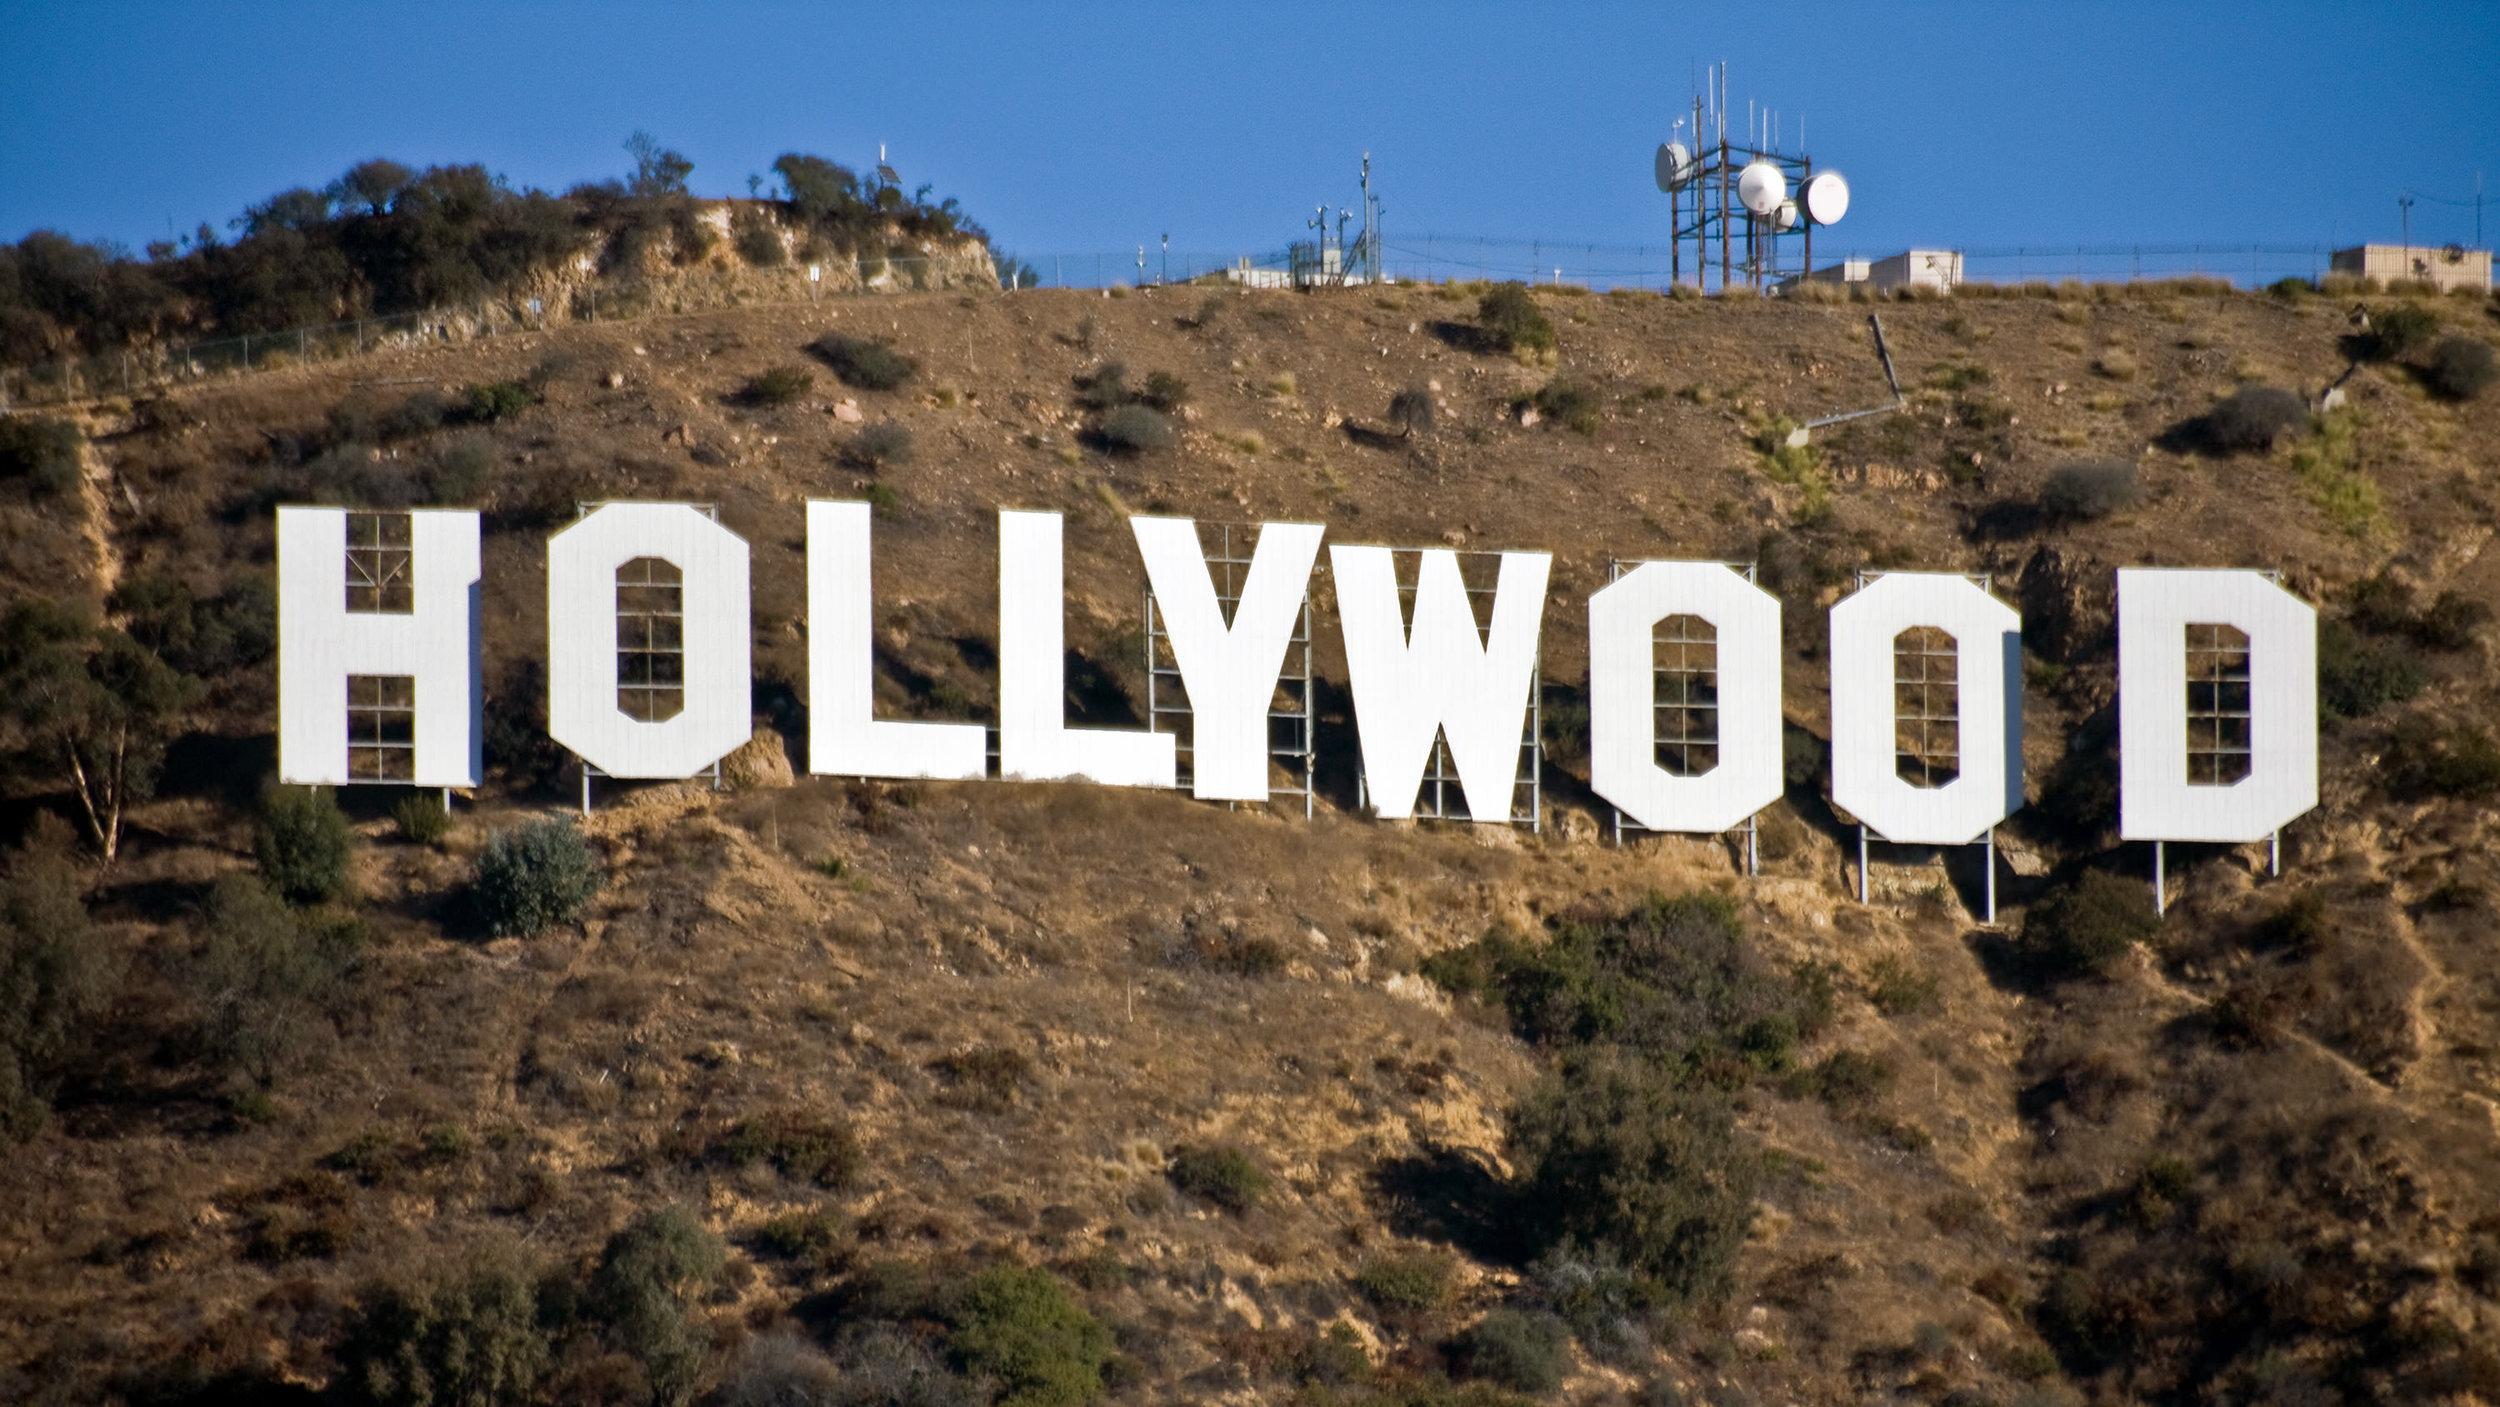 biggest_myth_hollywood_sign.jpg